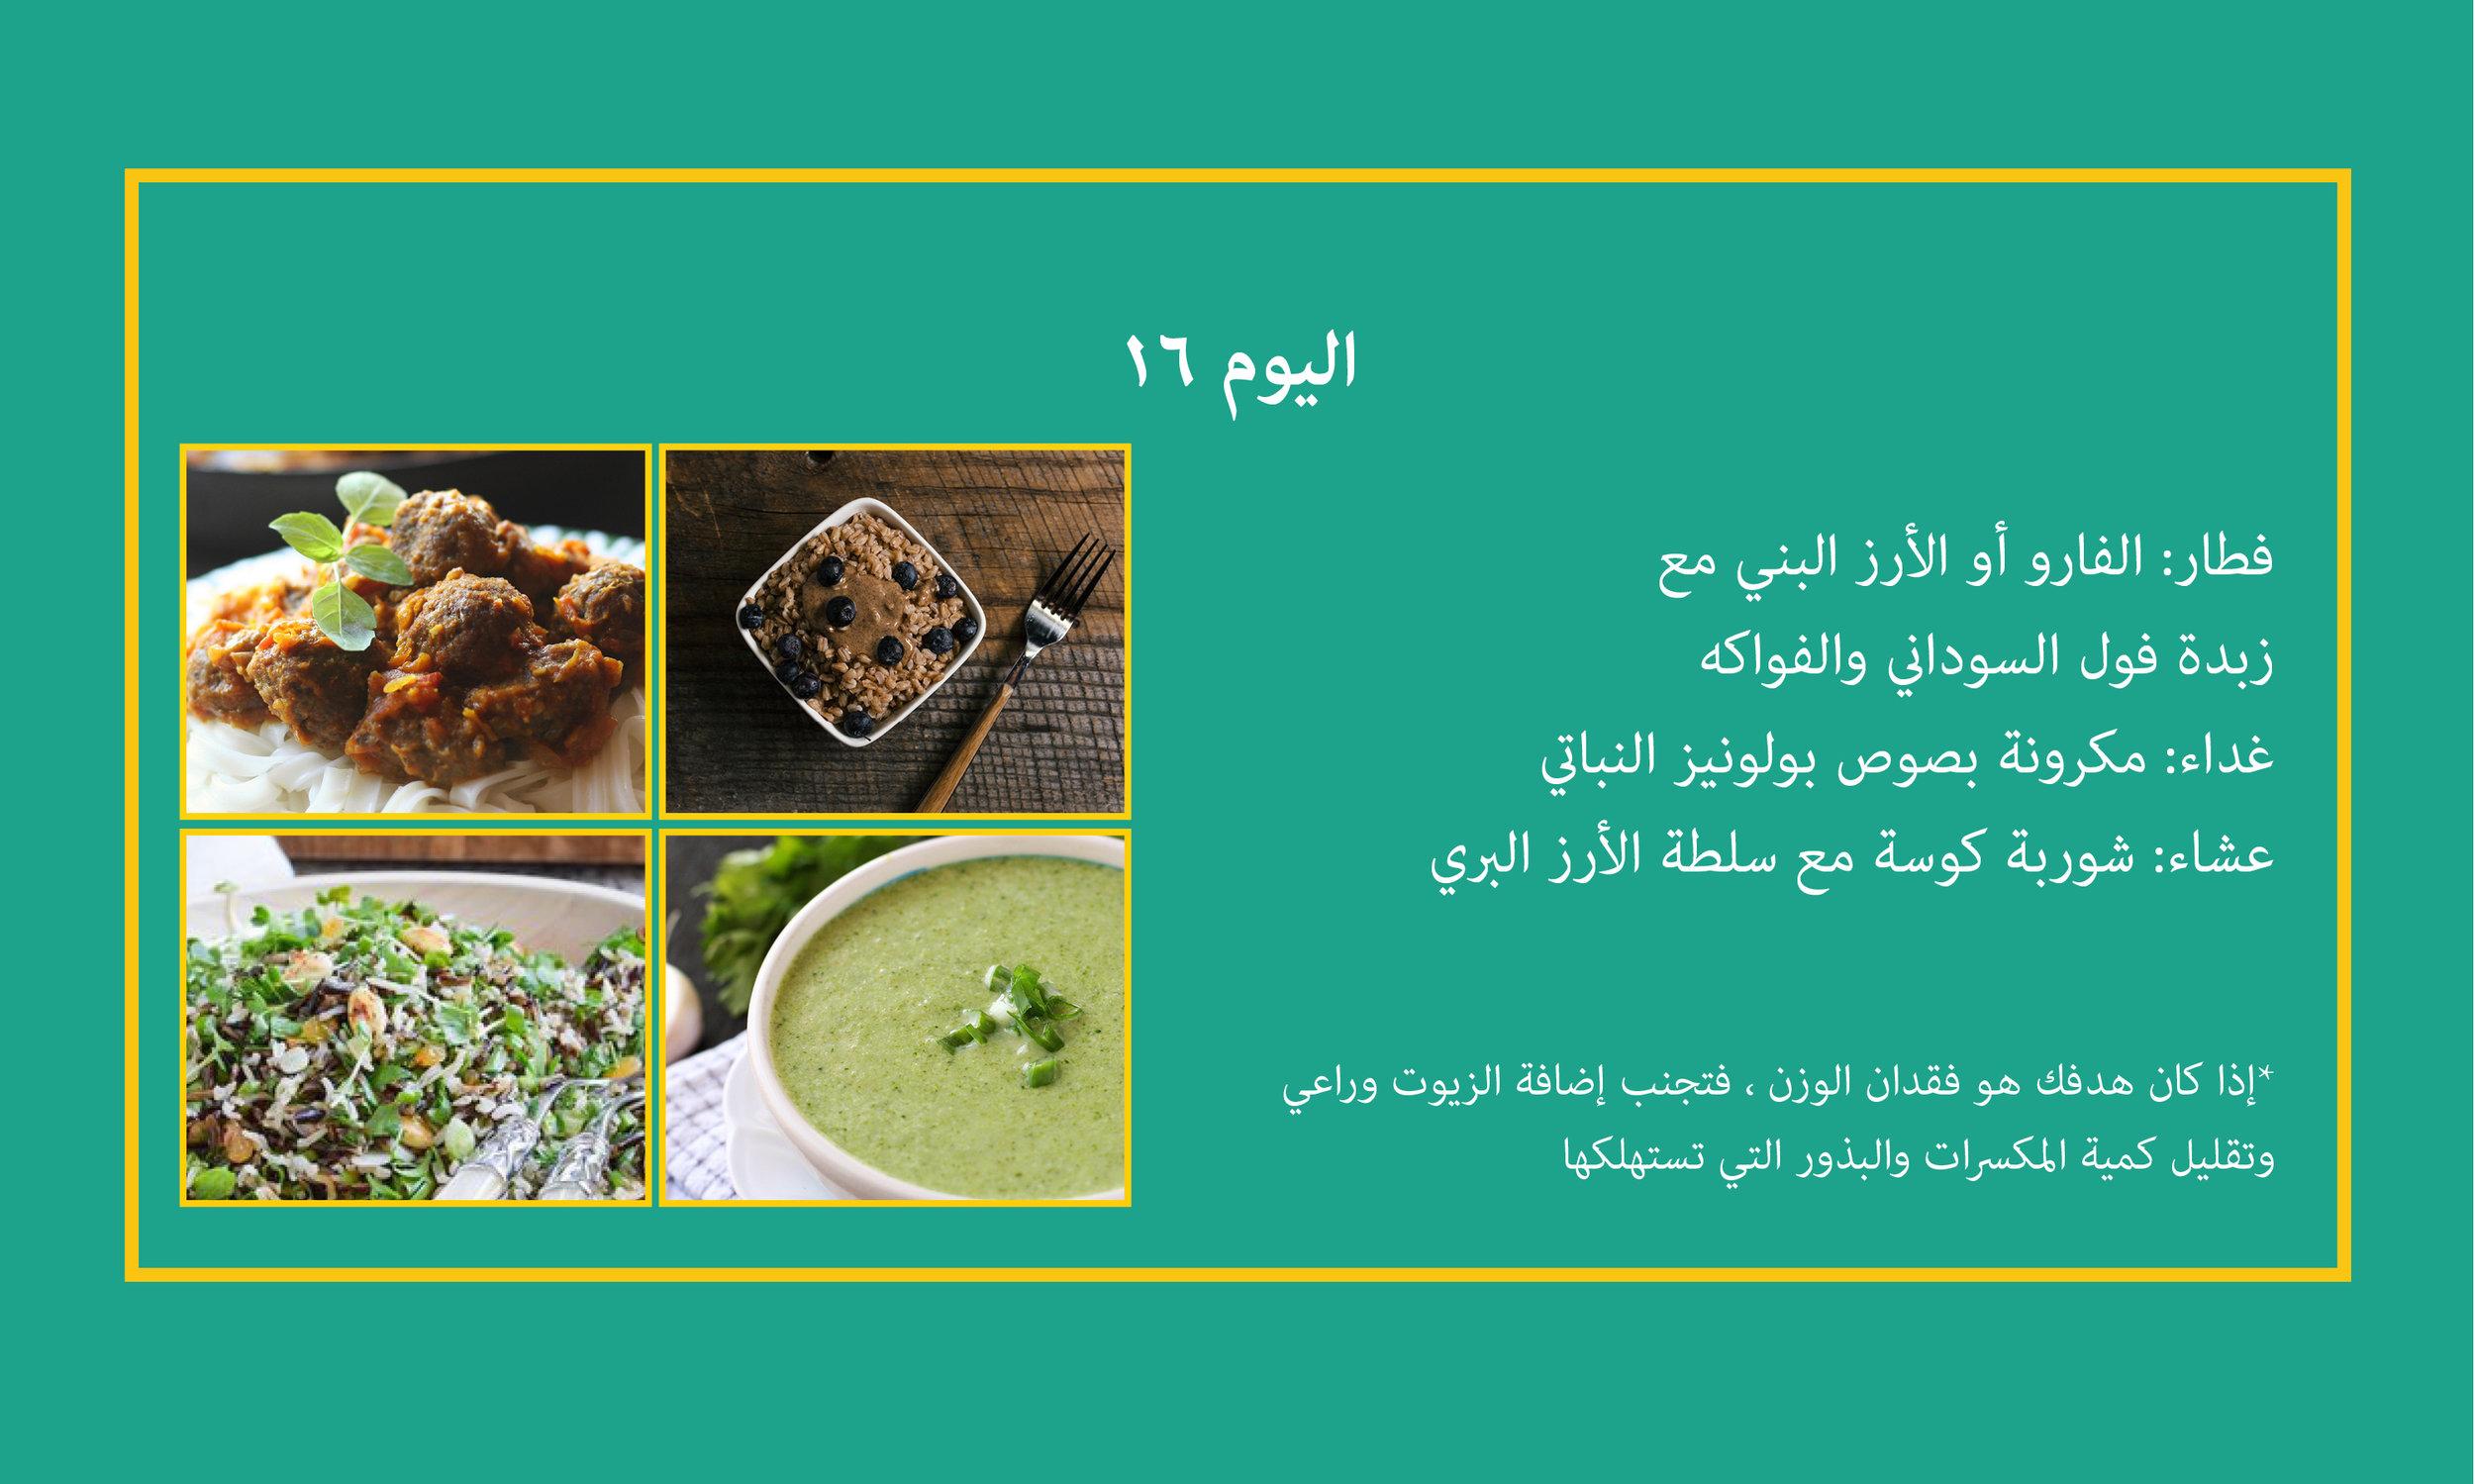 Day 16 Arabic.jpg